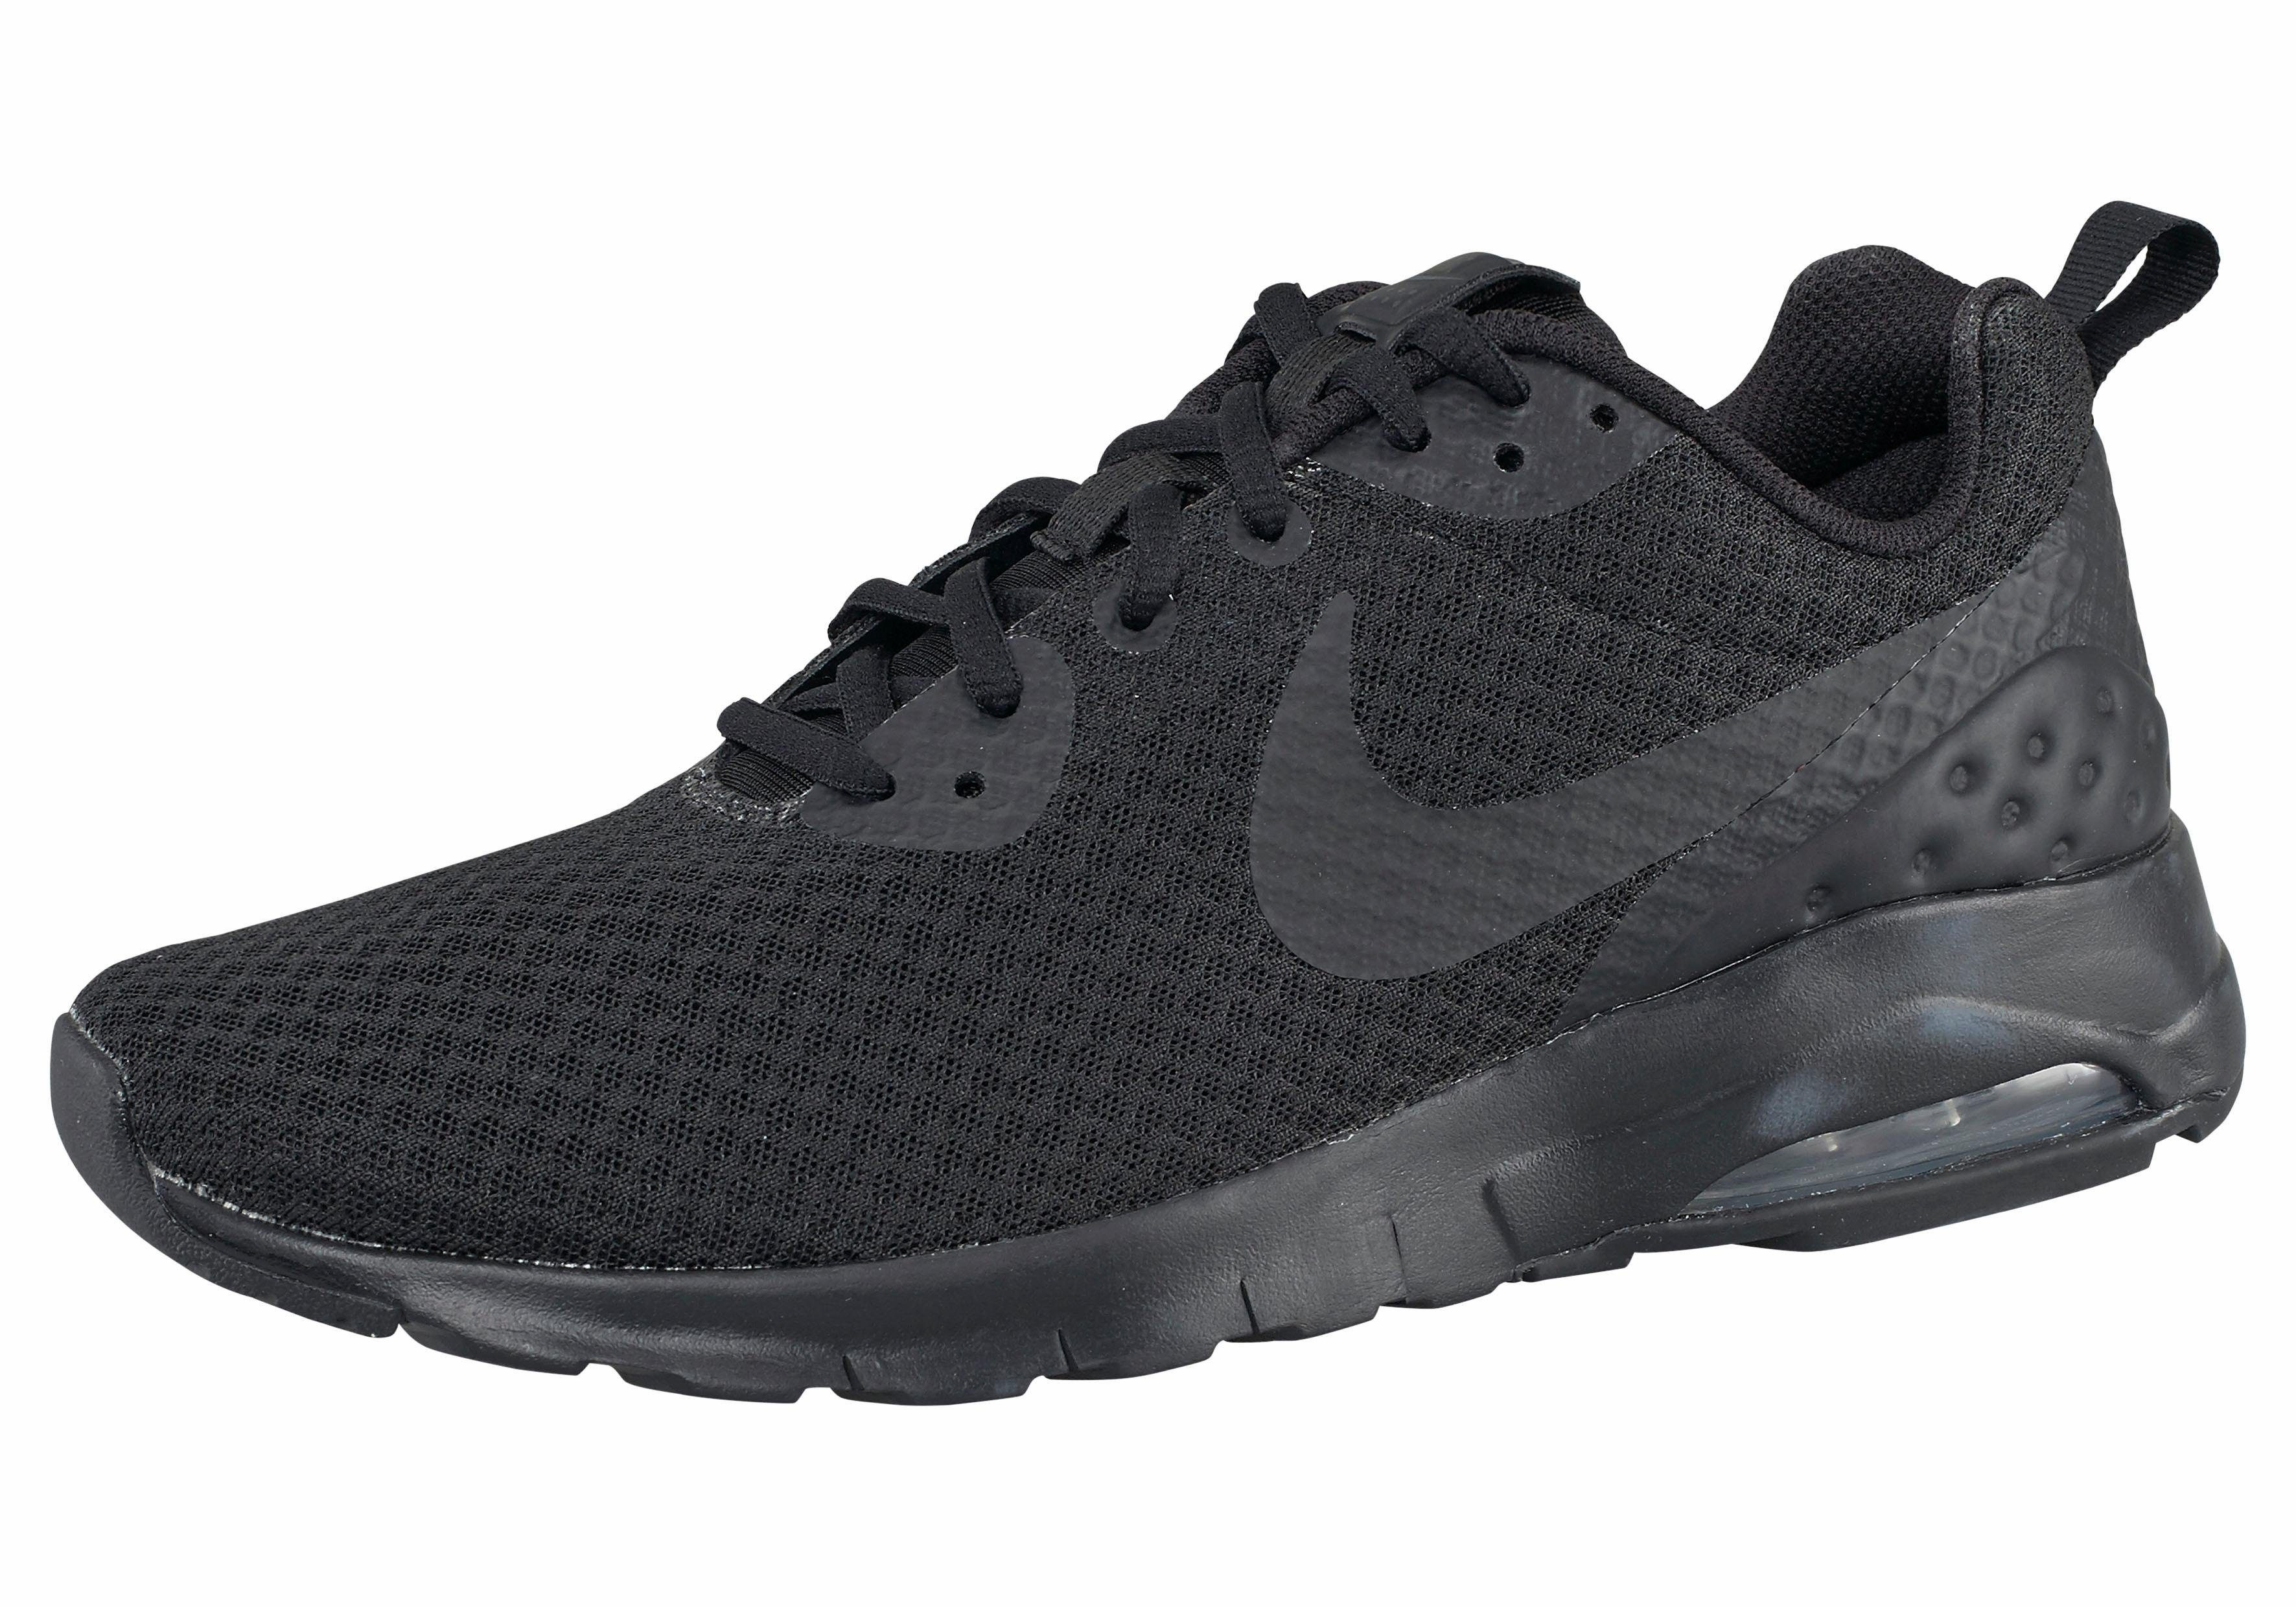 Nike »Air Max Motion Lw« Sneaker online kaufen | OTTO